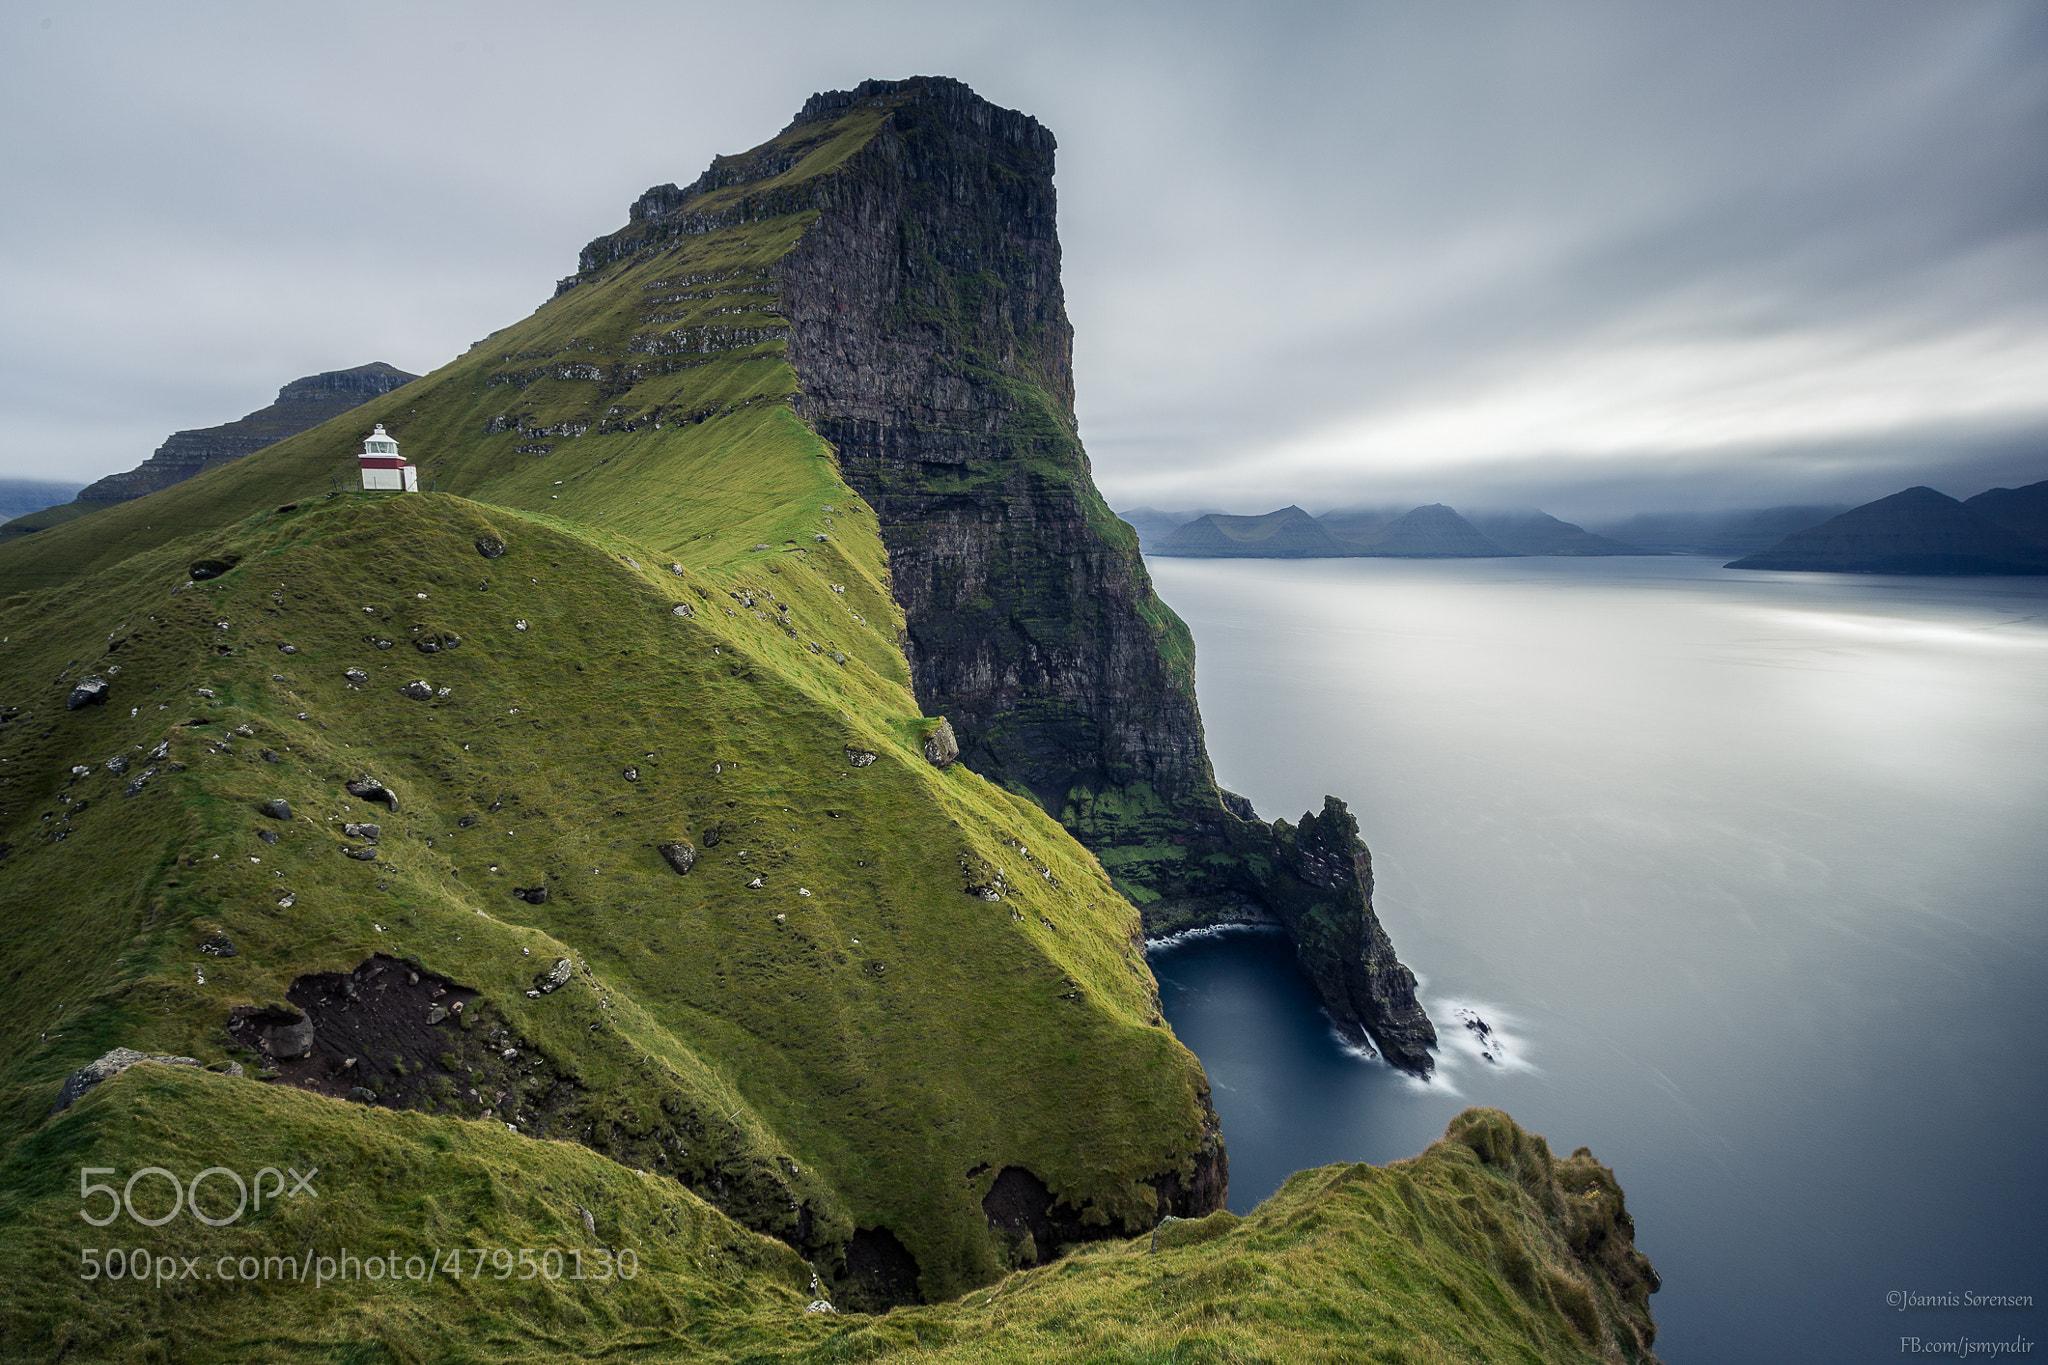 Photograph Lighthouse by Jóannis Sørensen on 500px